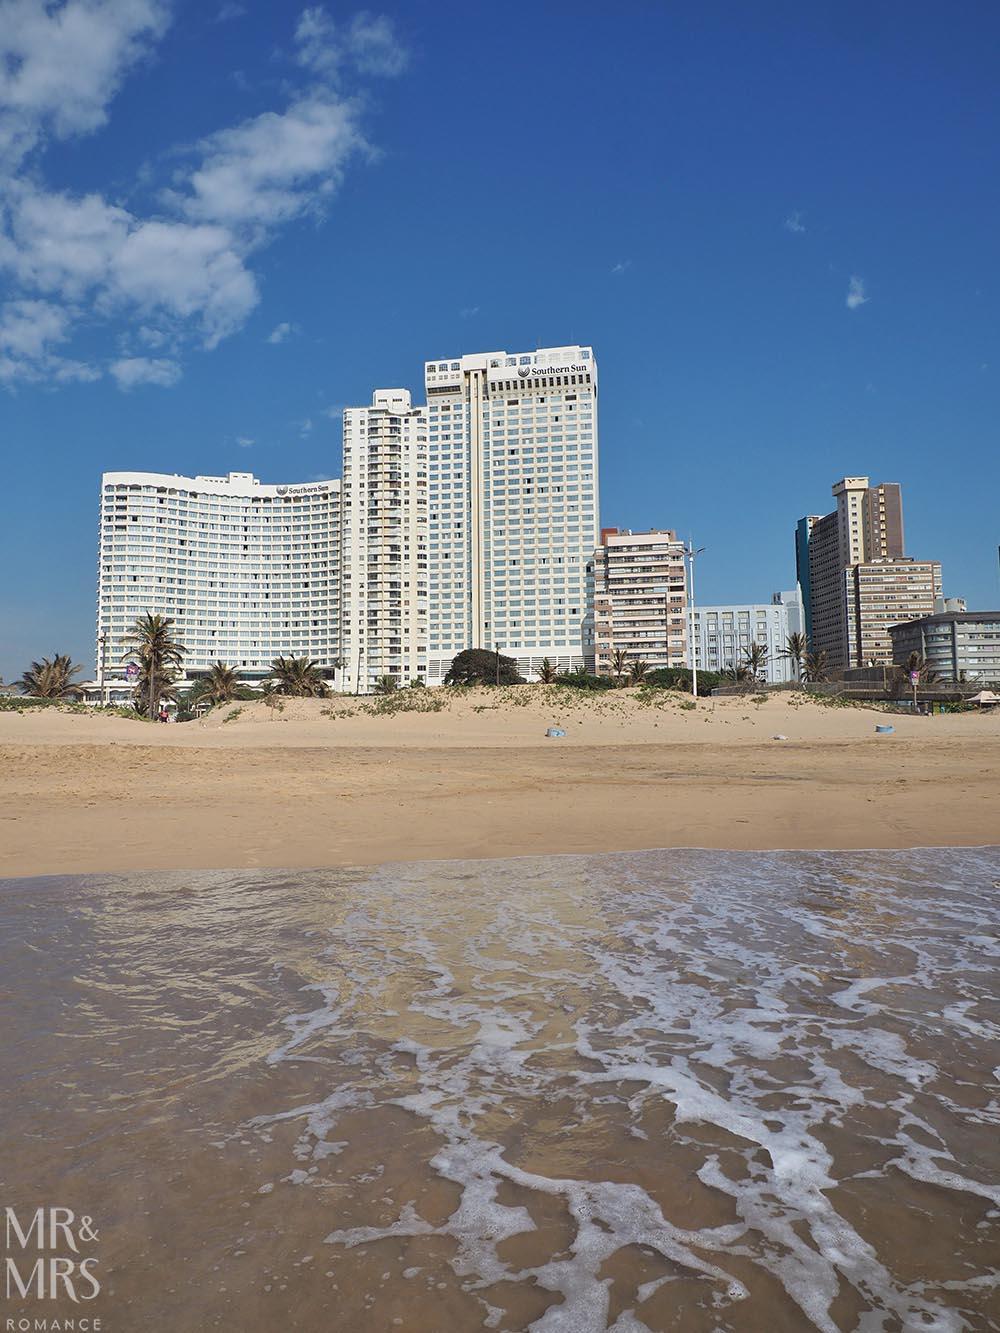 South Africa Tourism - Mahararani Hotel, Durban